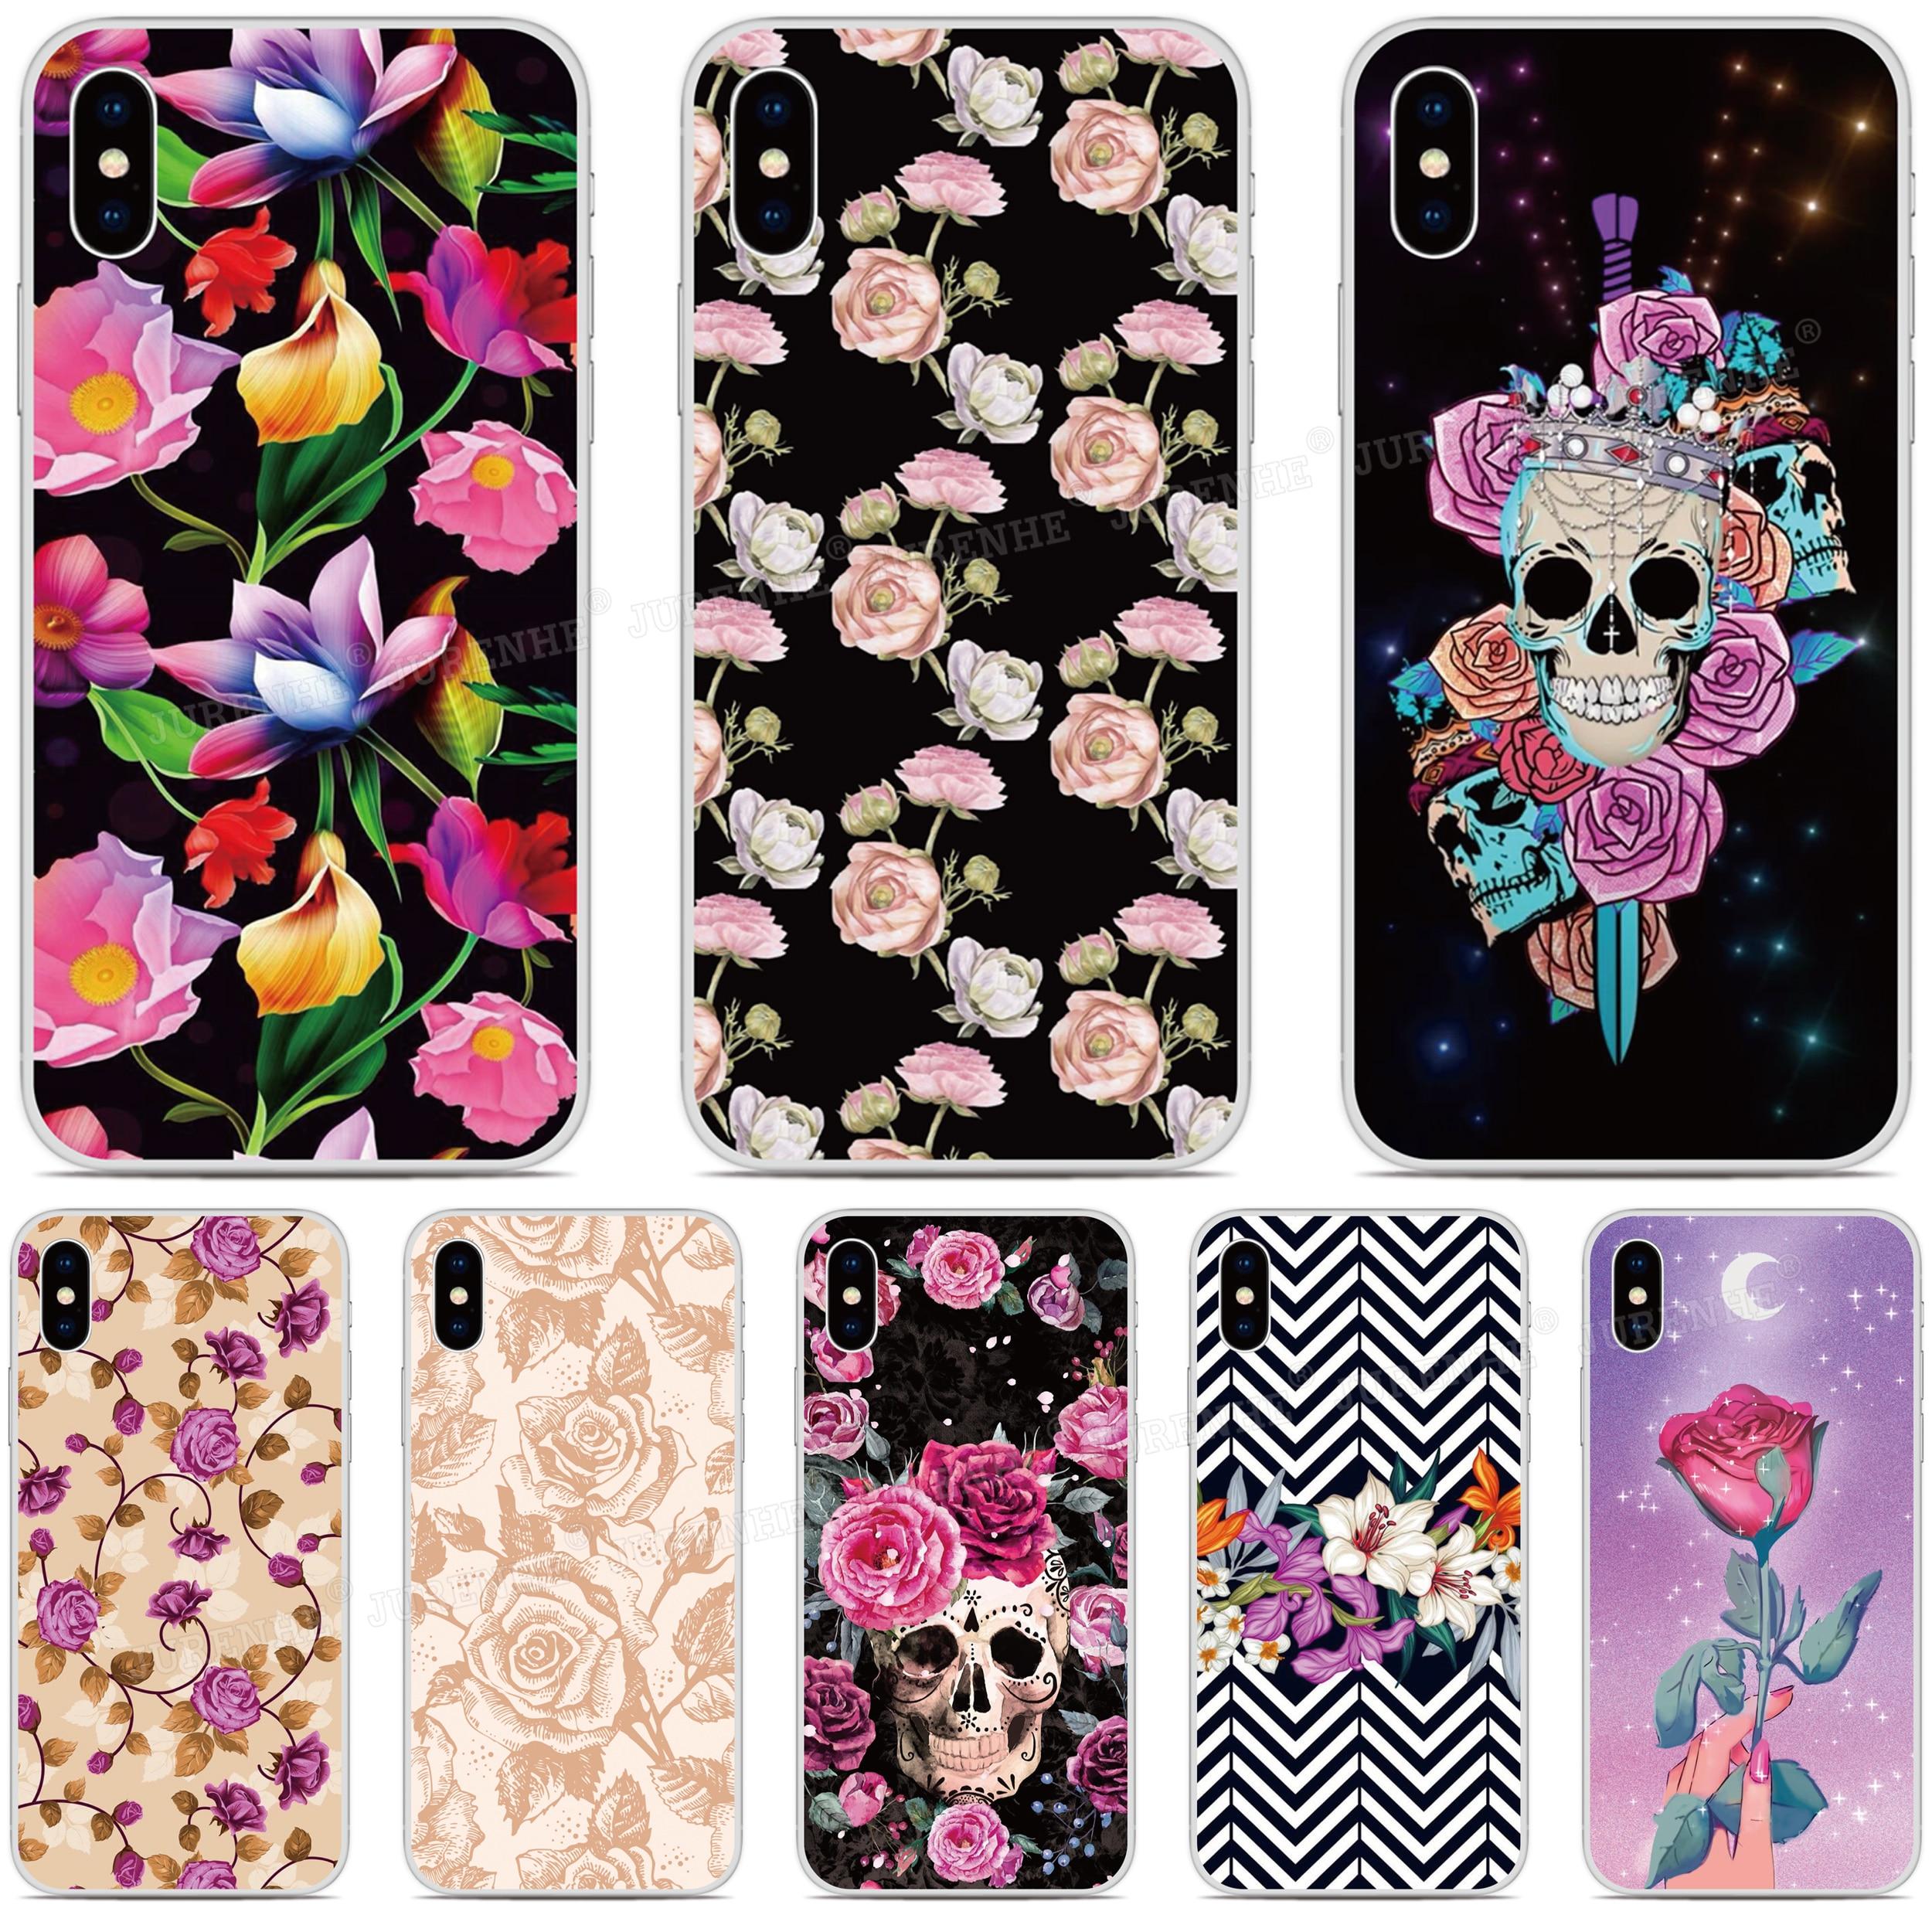 tpu Soft Silicone Beautiful Flower Phone Case For Motorola-Moto E7 G8 Play G Stylus G7 Power E6 Plus One Macro Rubber Back Cover